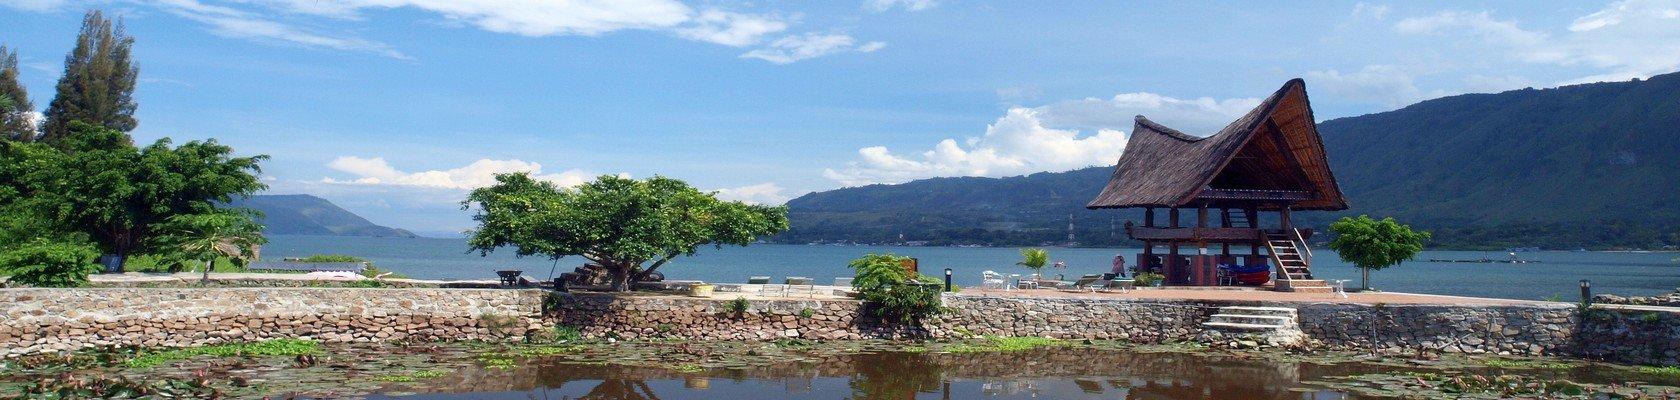 Samosir eiland